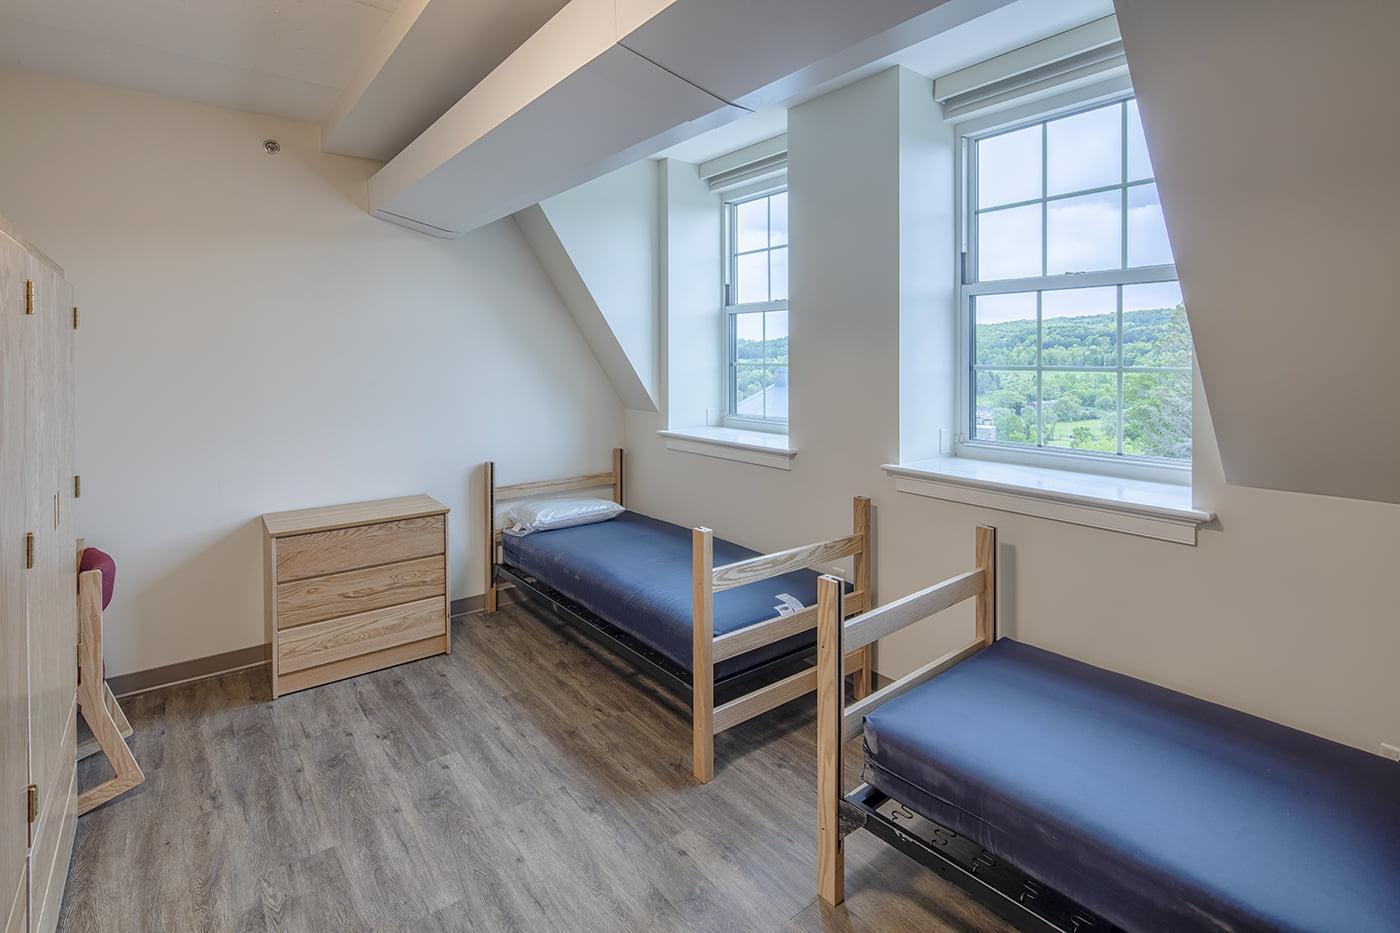 Colgate University Residence Halls Room